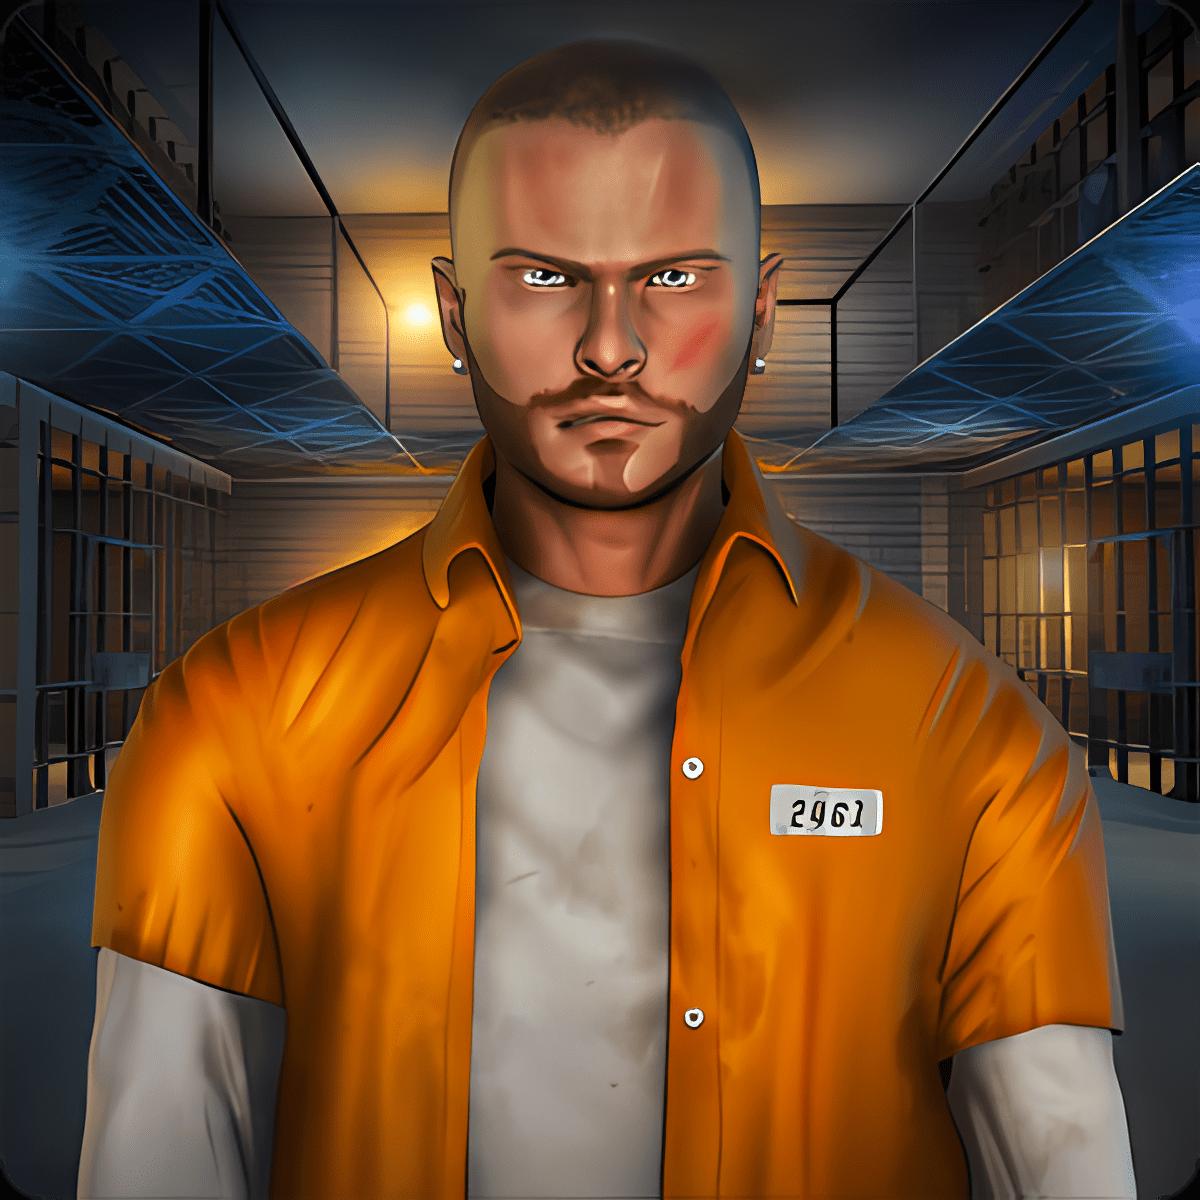 Prison Breakout Adventure